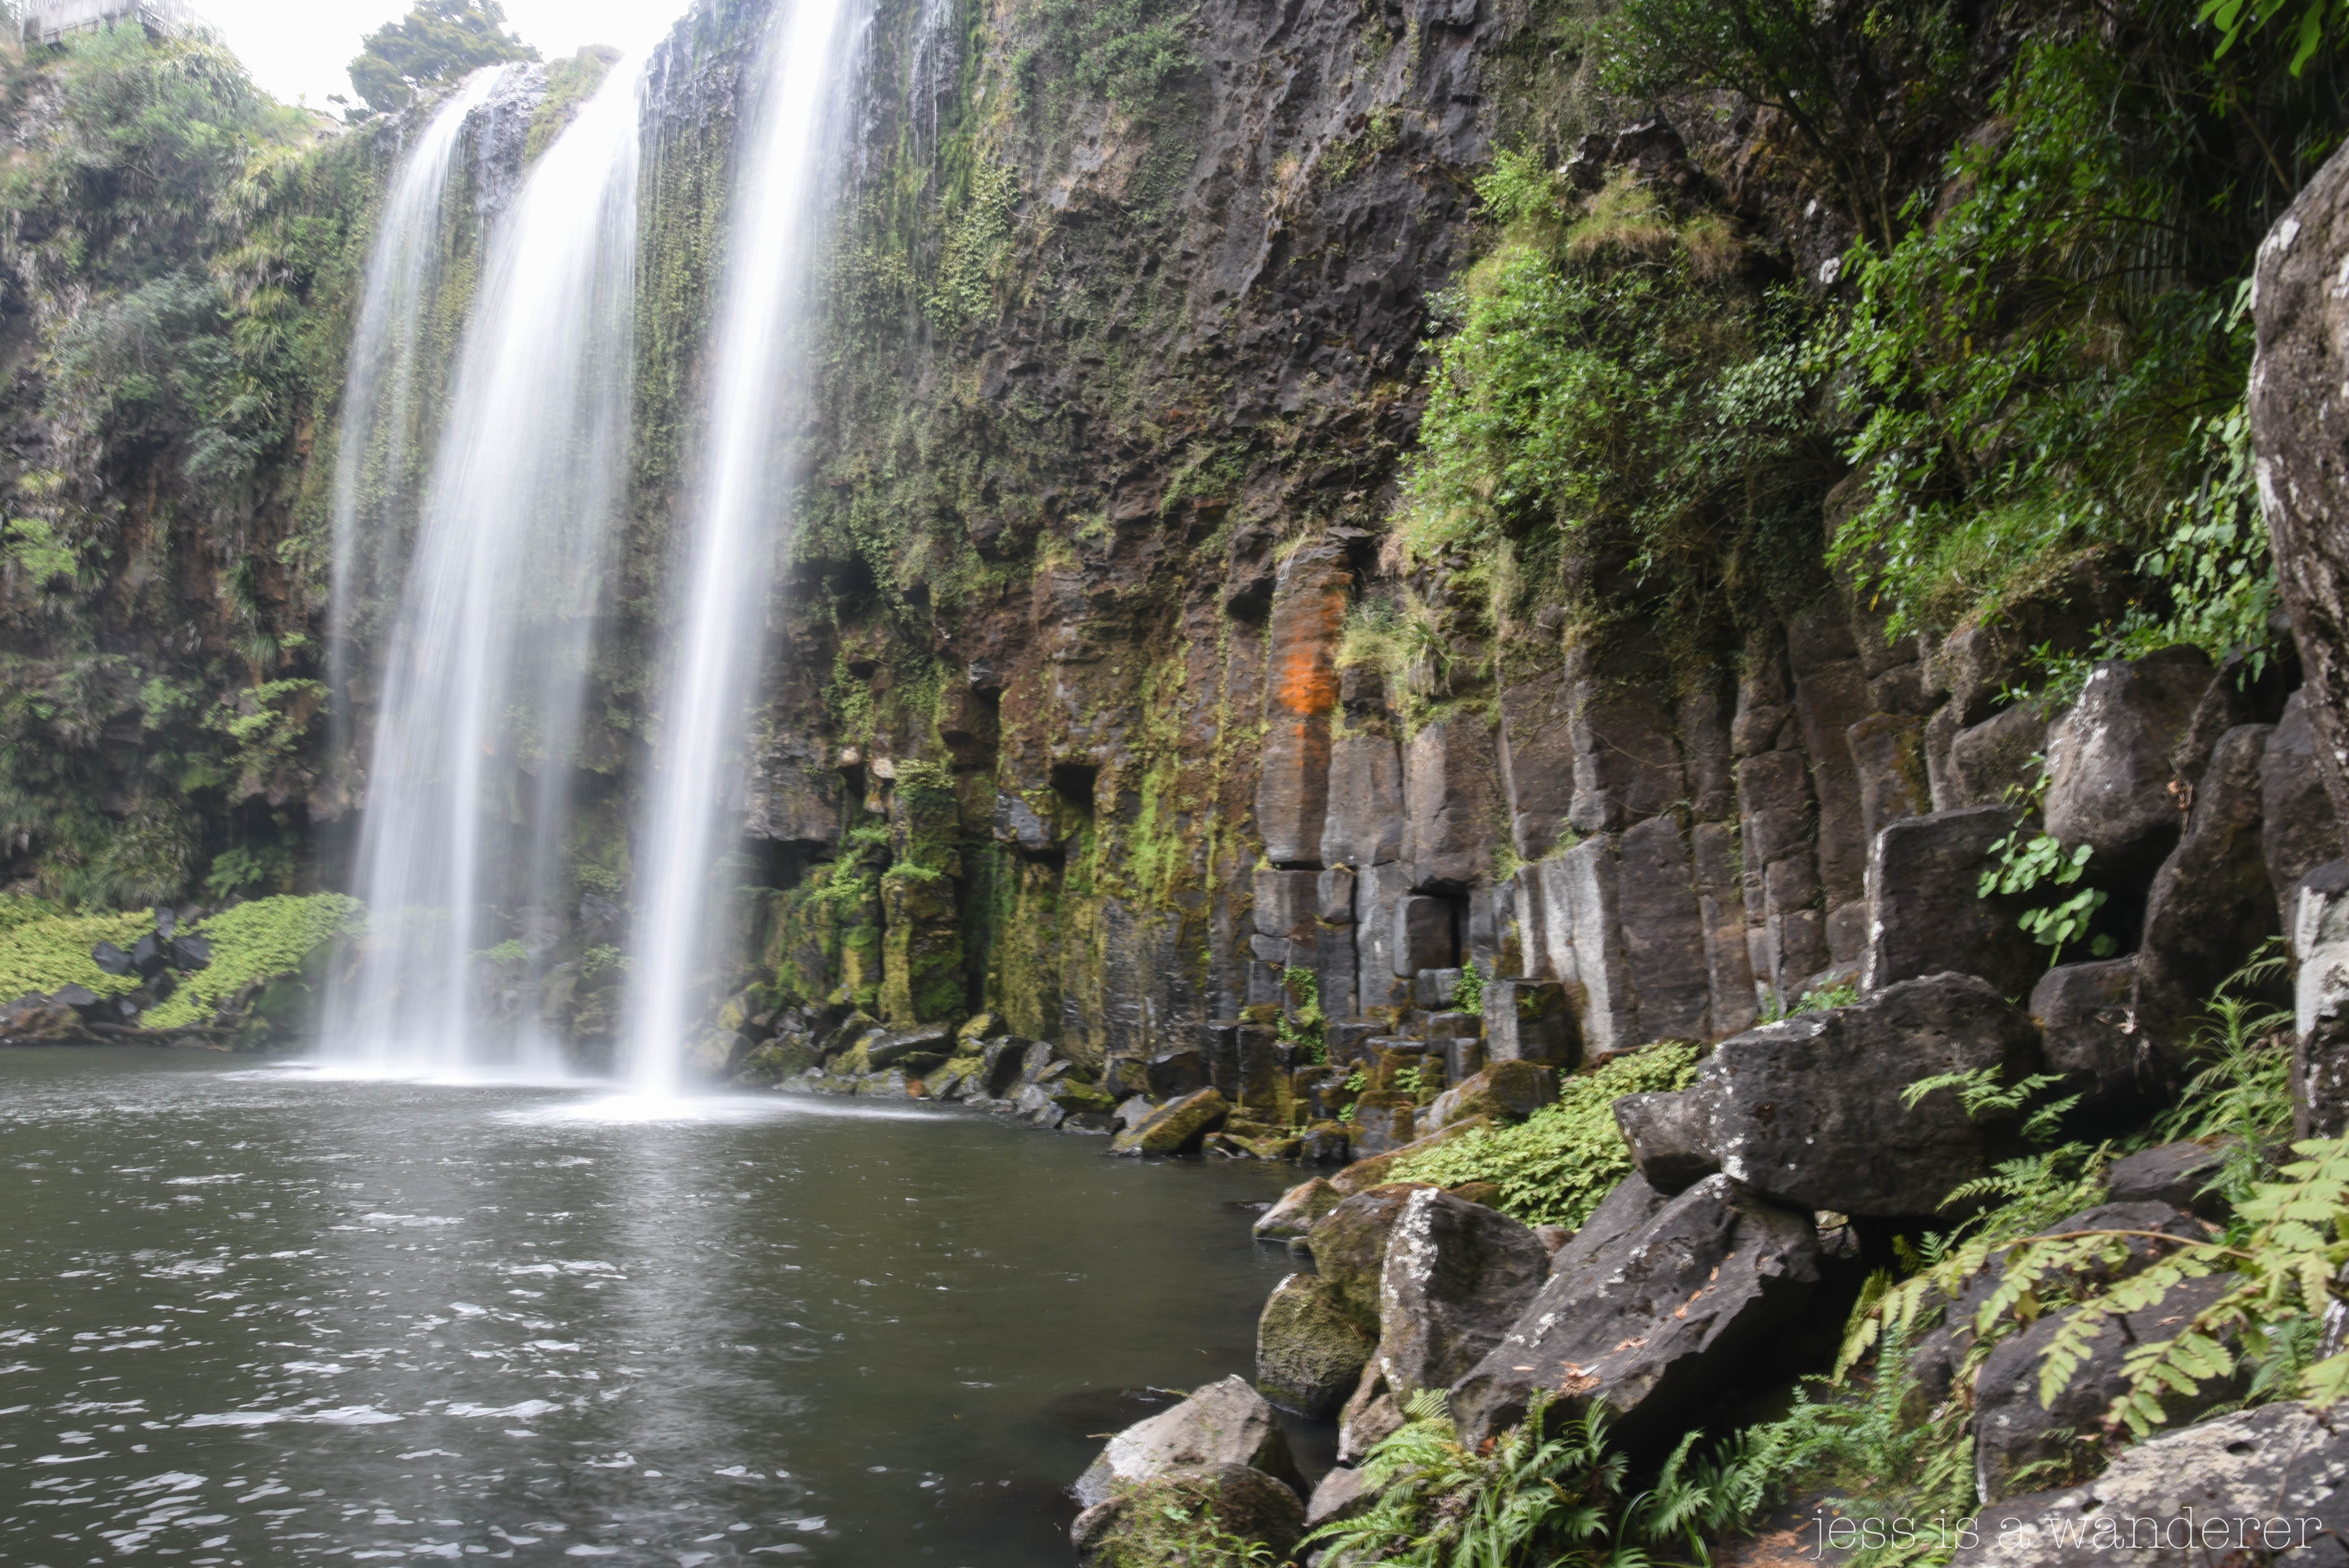 Whangarei Rock Pools